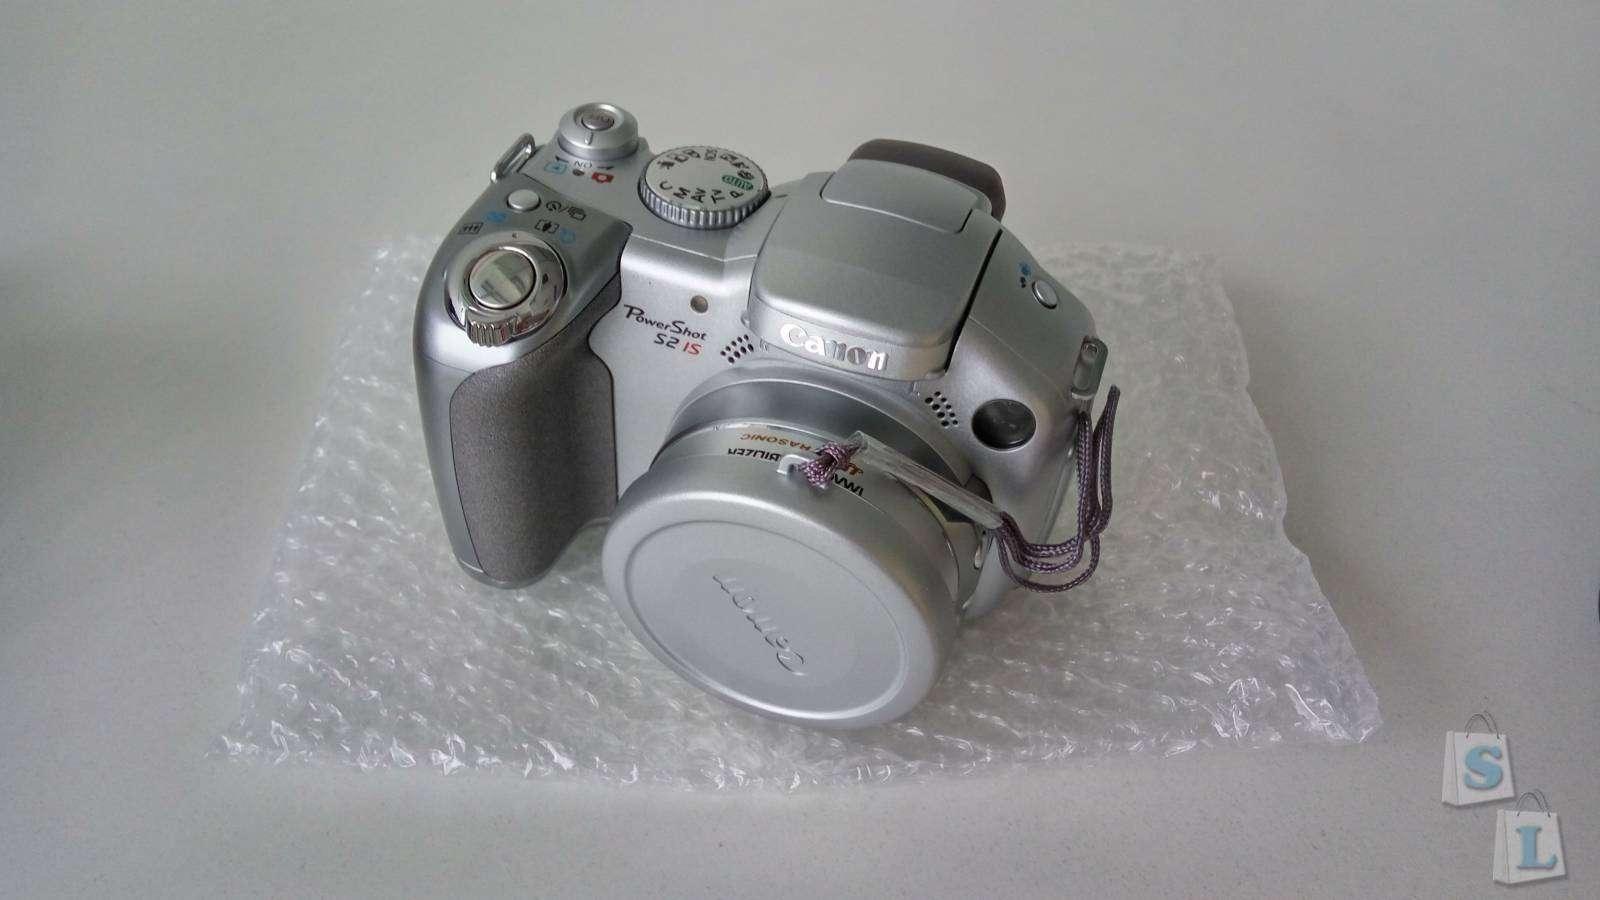 Другие - Украина: Чистка объектива Canon Powershot S2 IS - мастерская КУМ